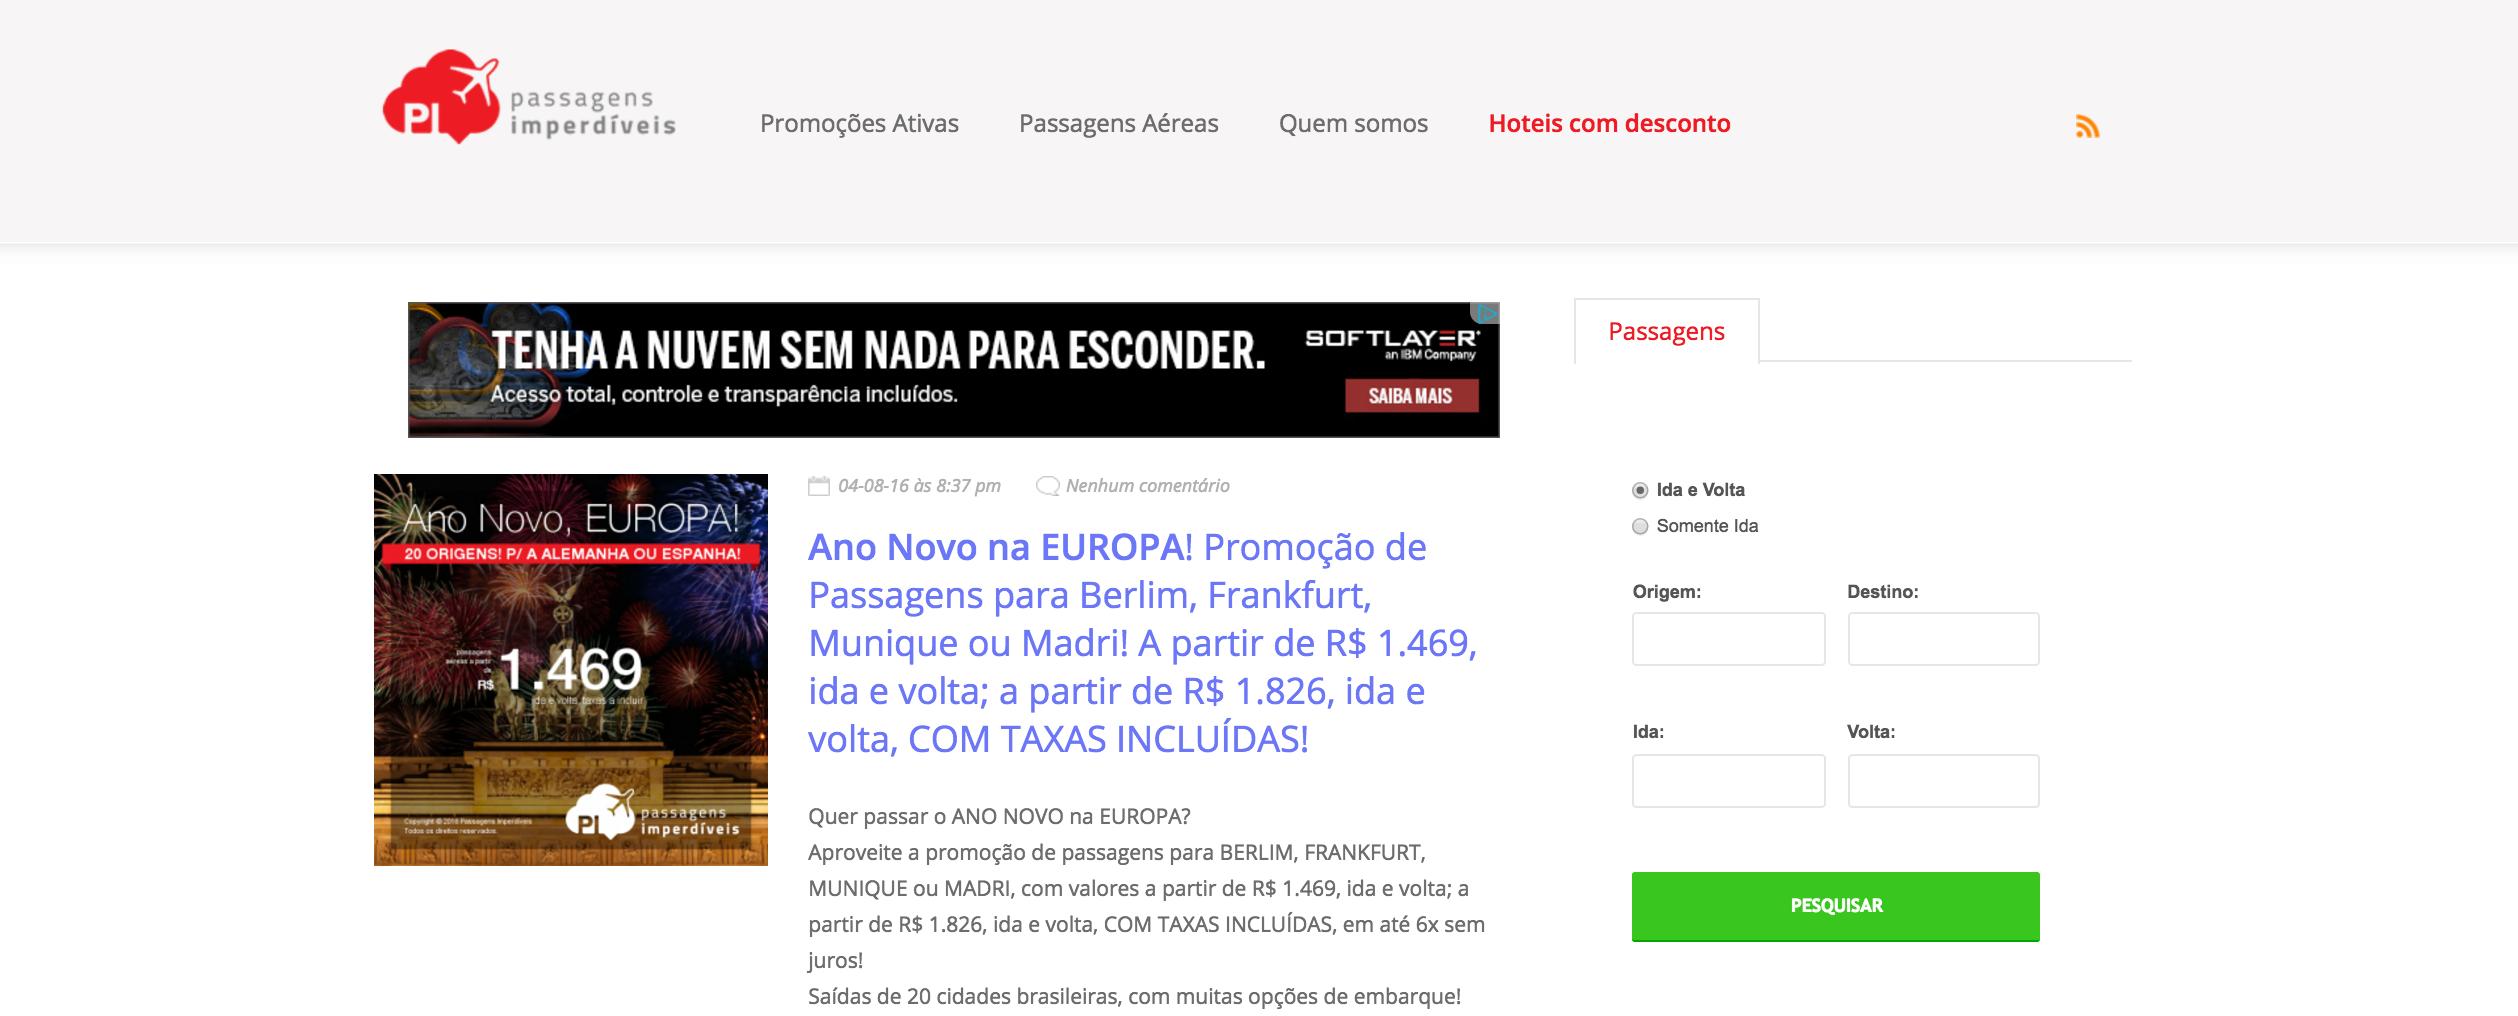 sites-para-encontrar-promocoes-de-passagens